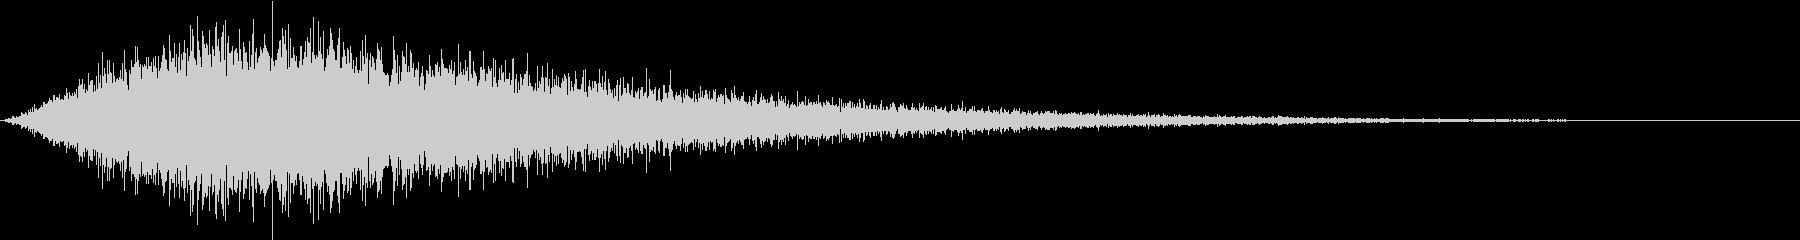 TV RADIO SFX9 ご本人登場風の未再生の波形